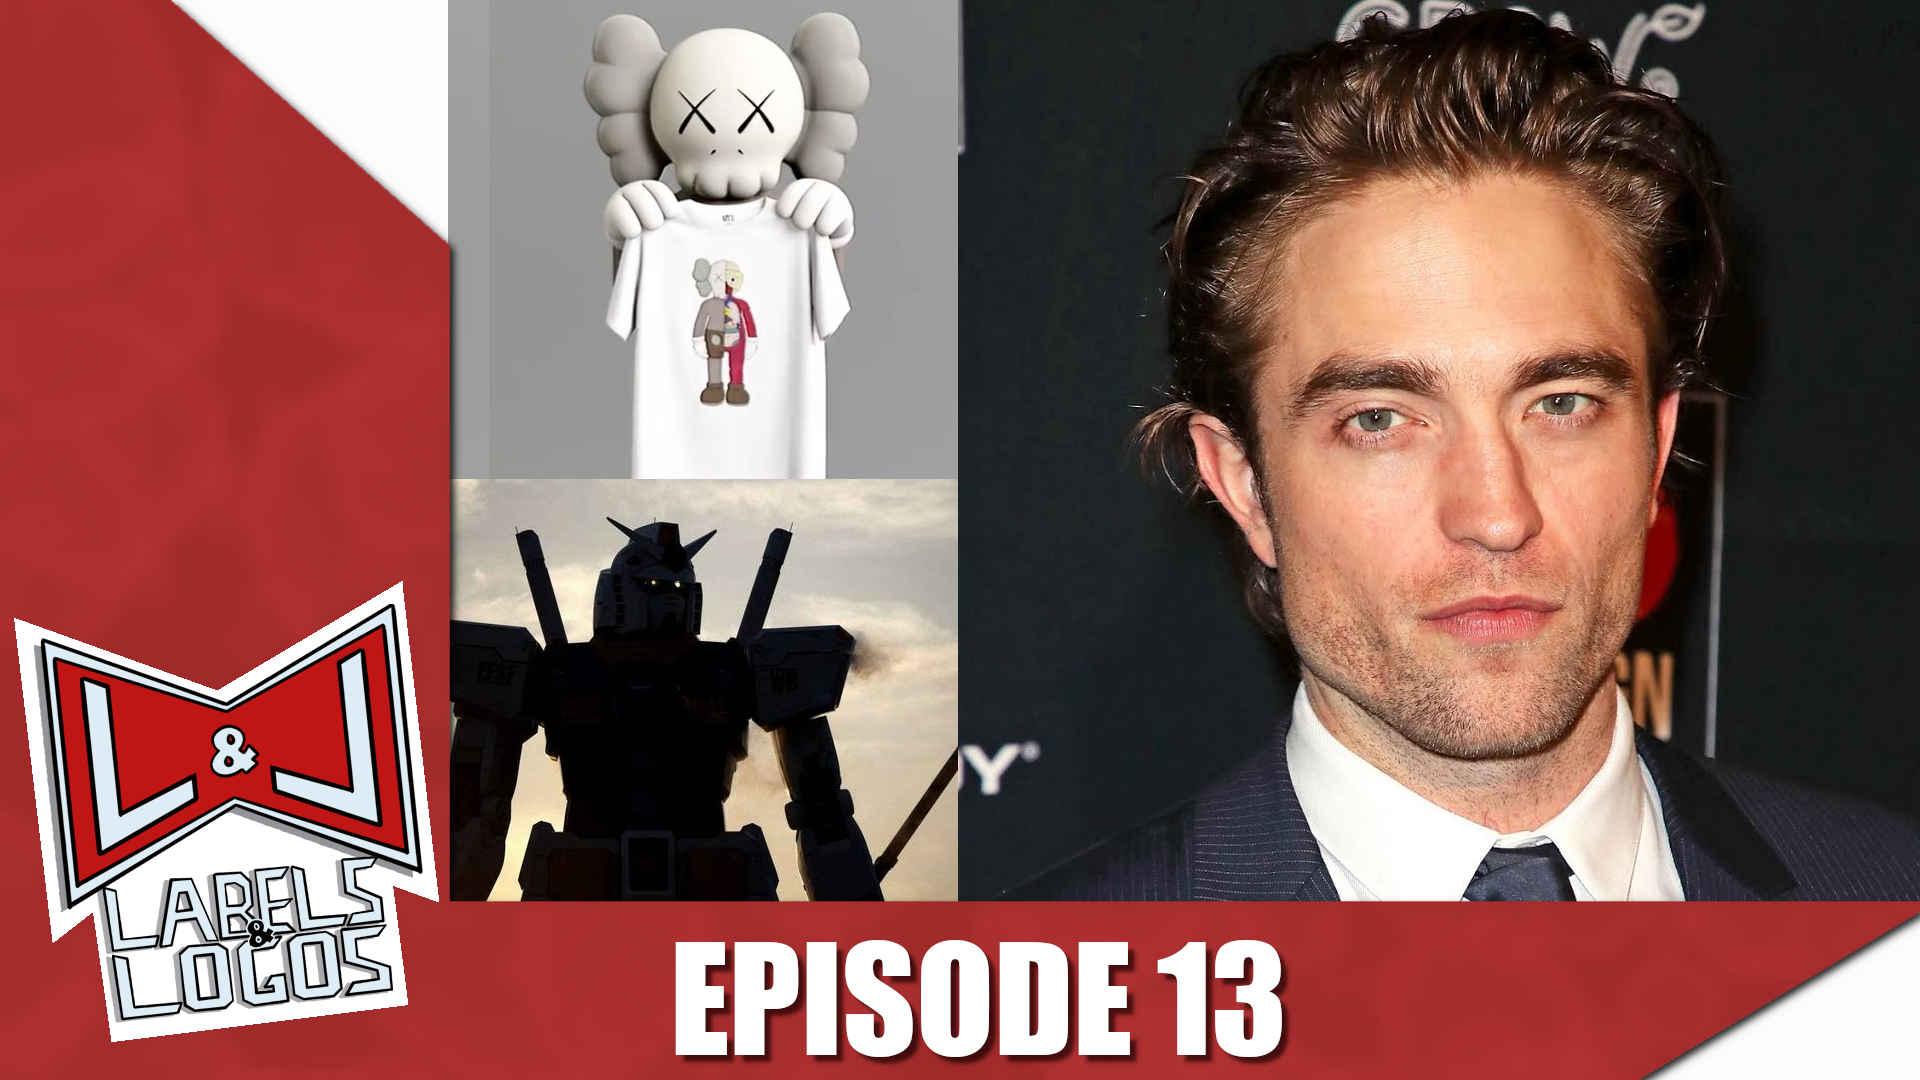 Labels & Logos - Episode 13